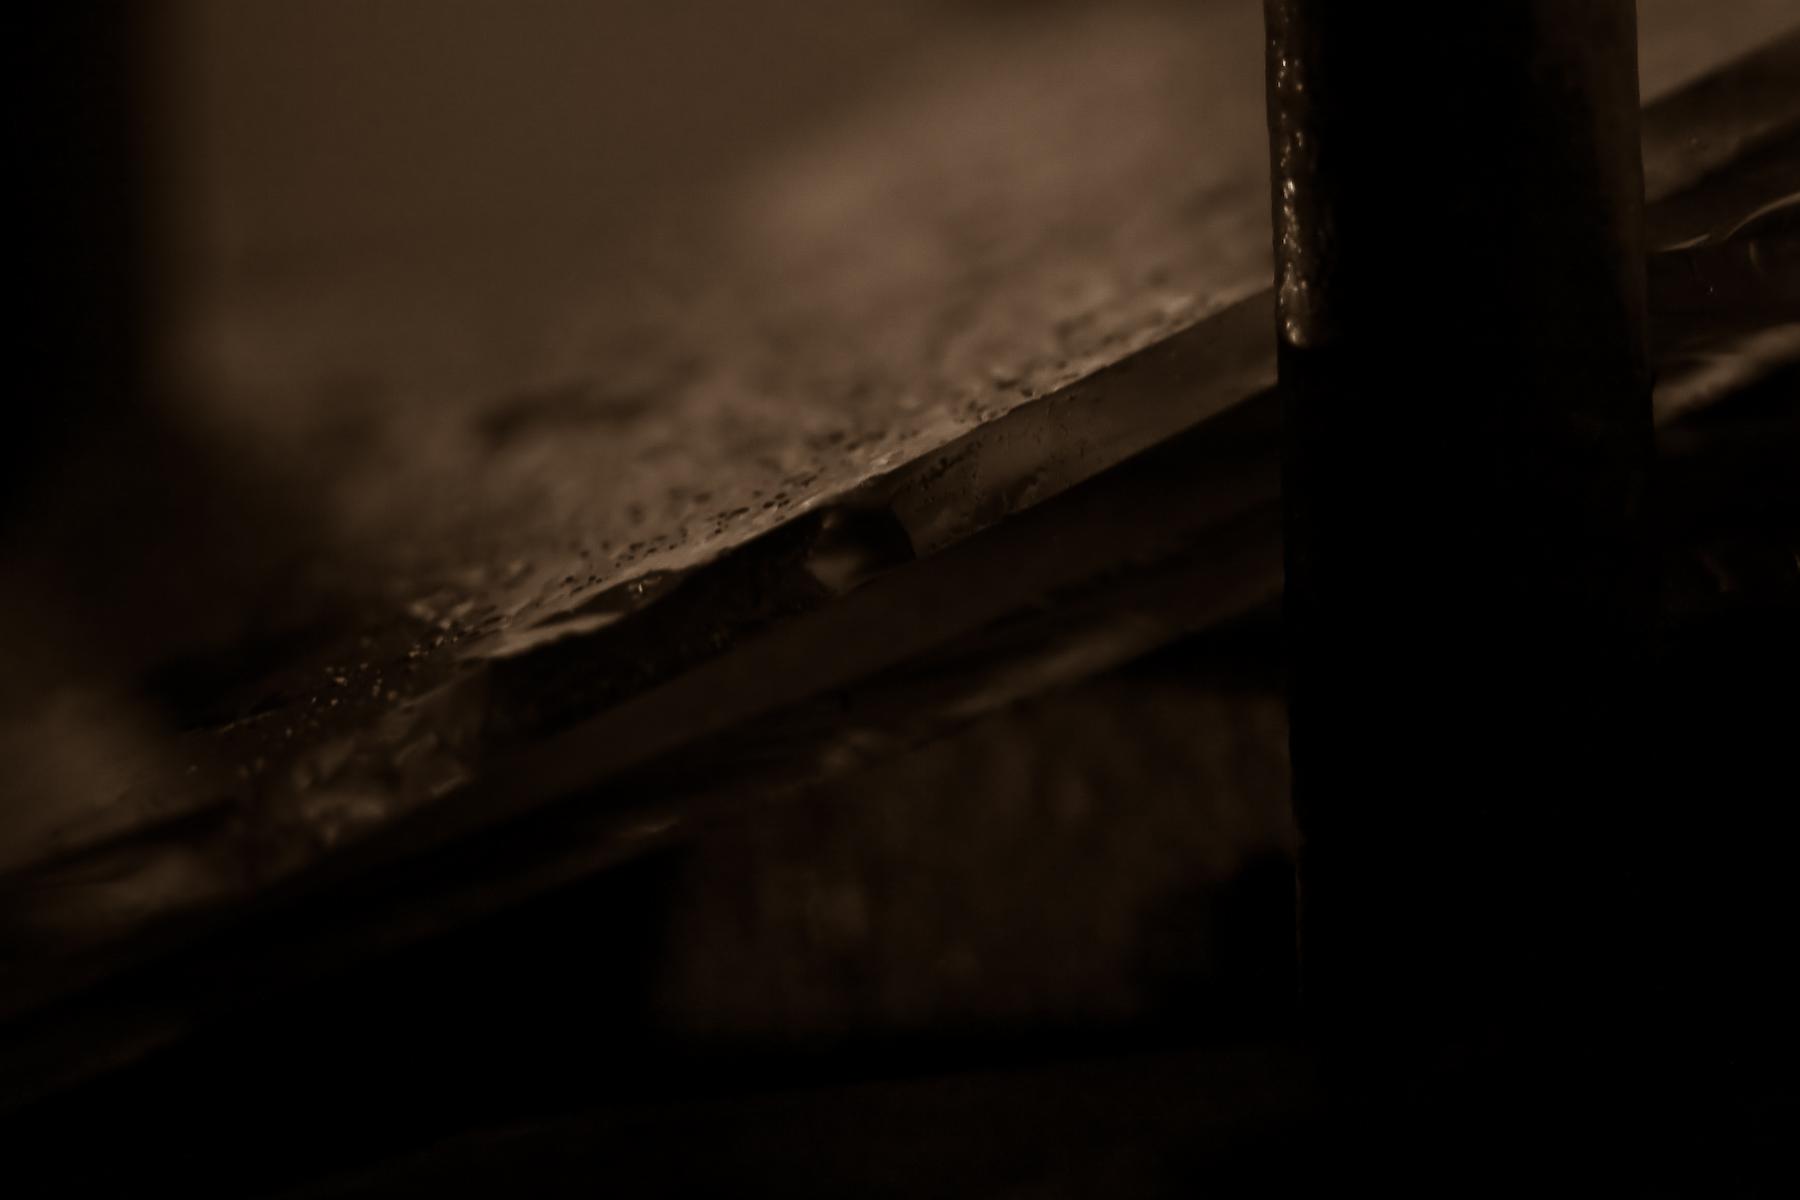 Broken glass, Abstract, Sharp, Shadows, Sepia, HQ Photo